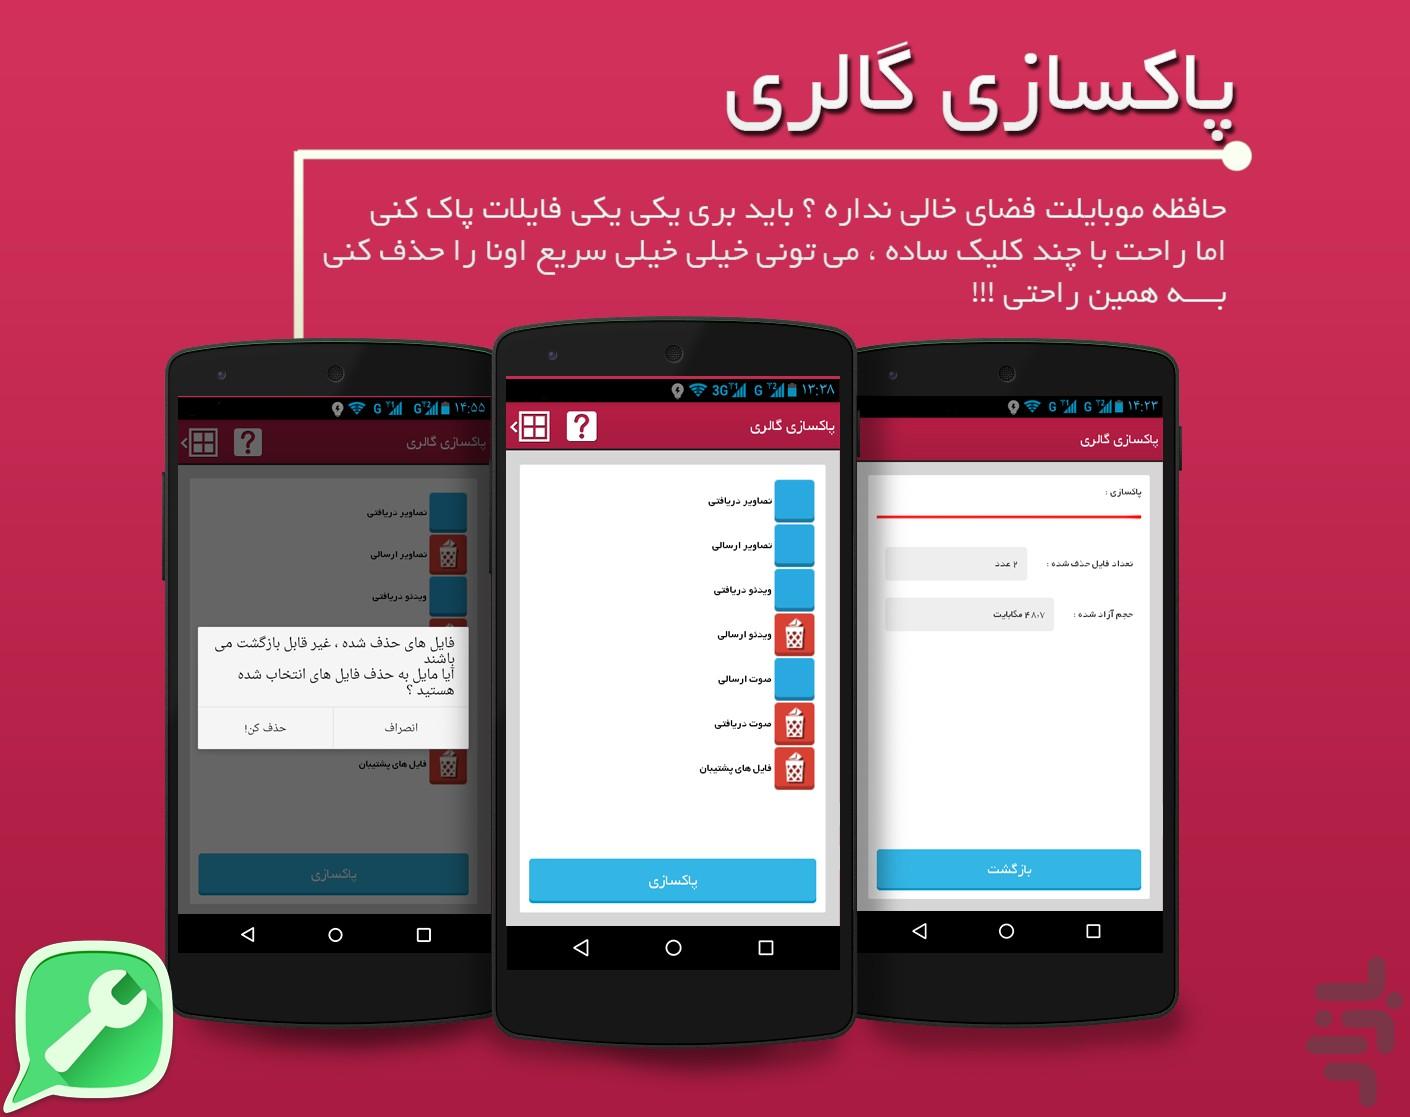 کد شش رقمی واتس اپ Скачать آچار واتس اپ (ابزار کاربردی) APK 1.3 для Андроид - другое скачать бесплатно.